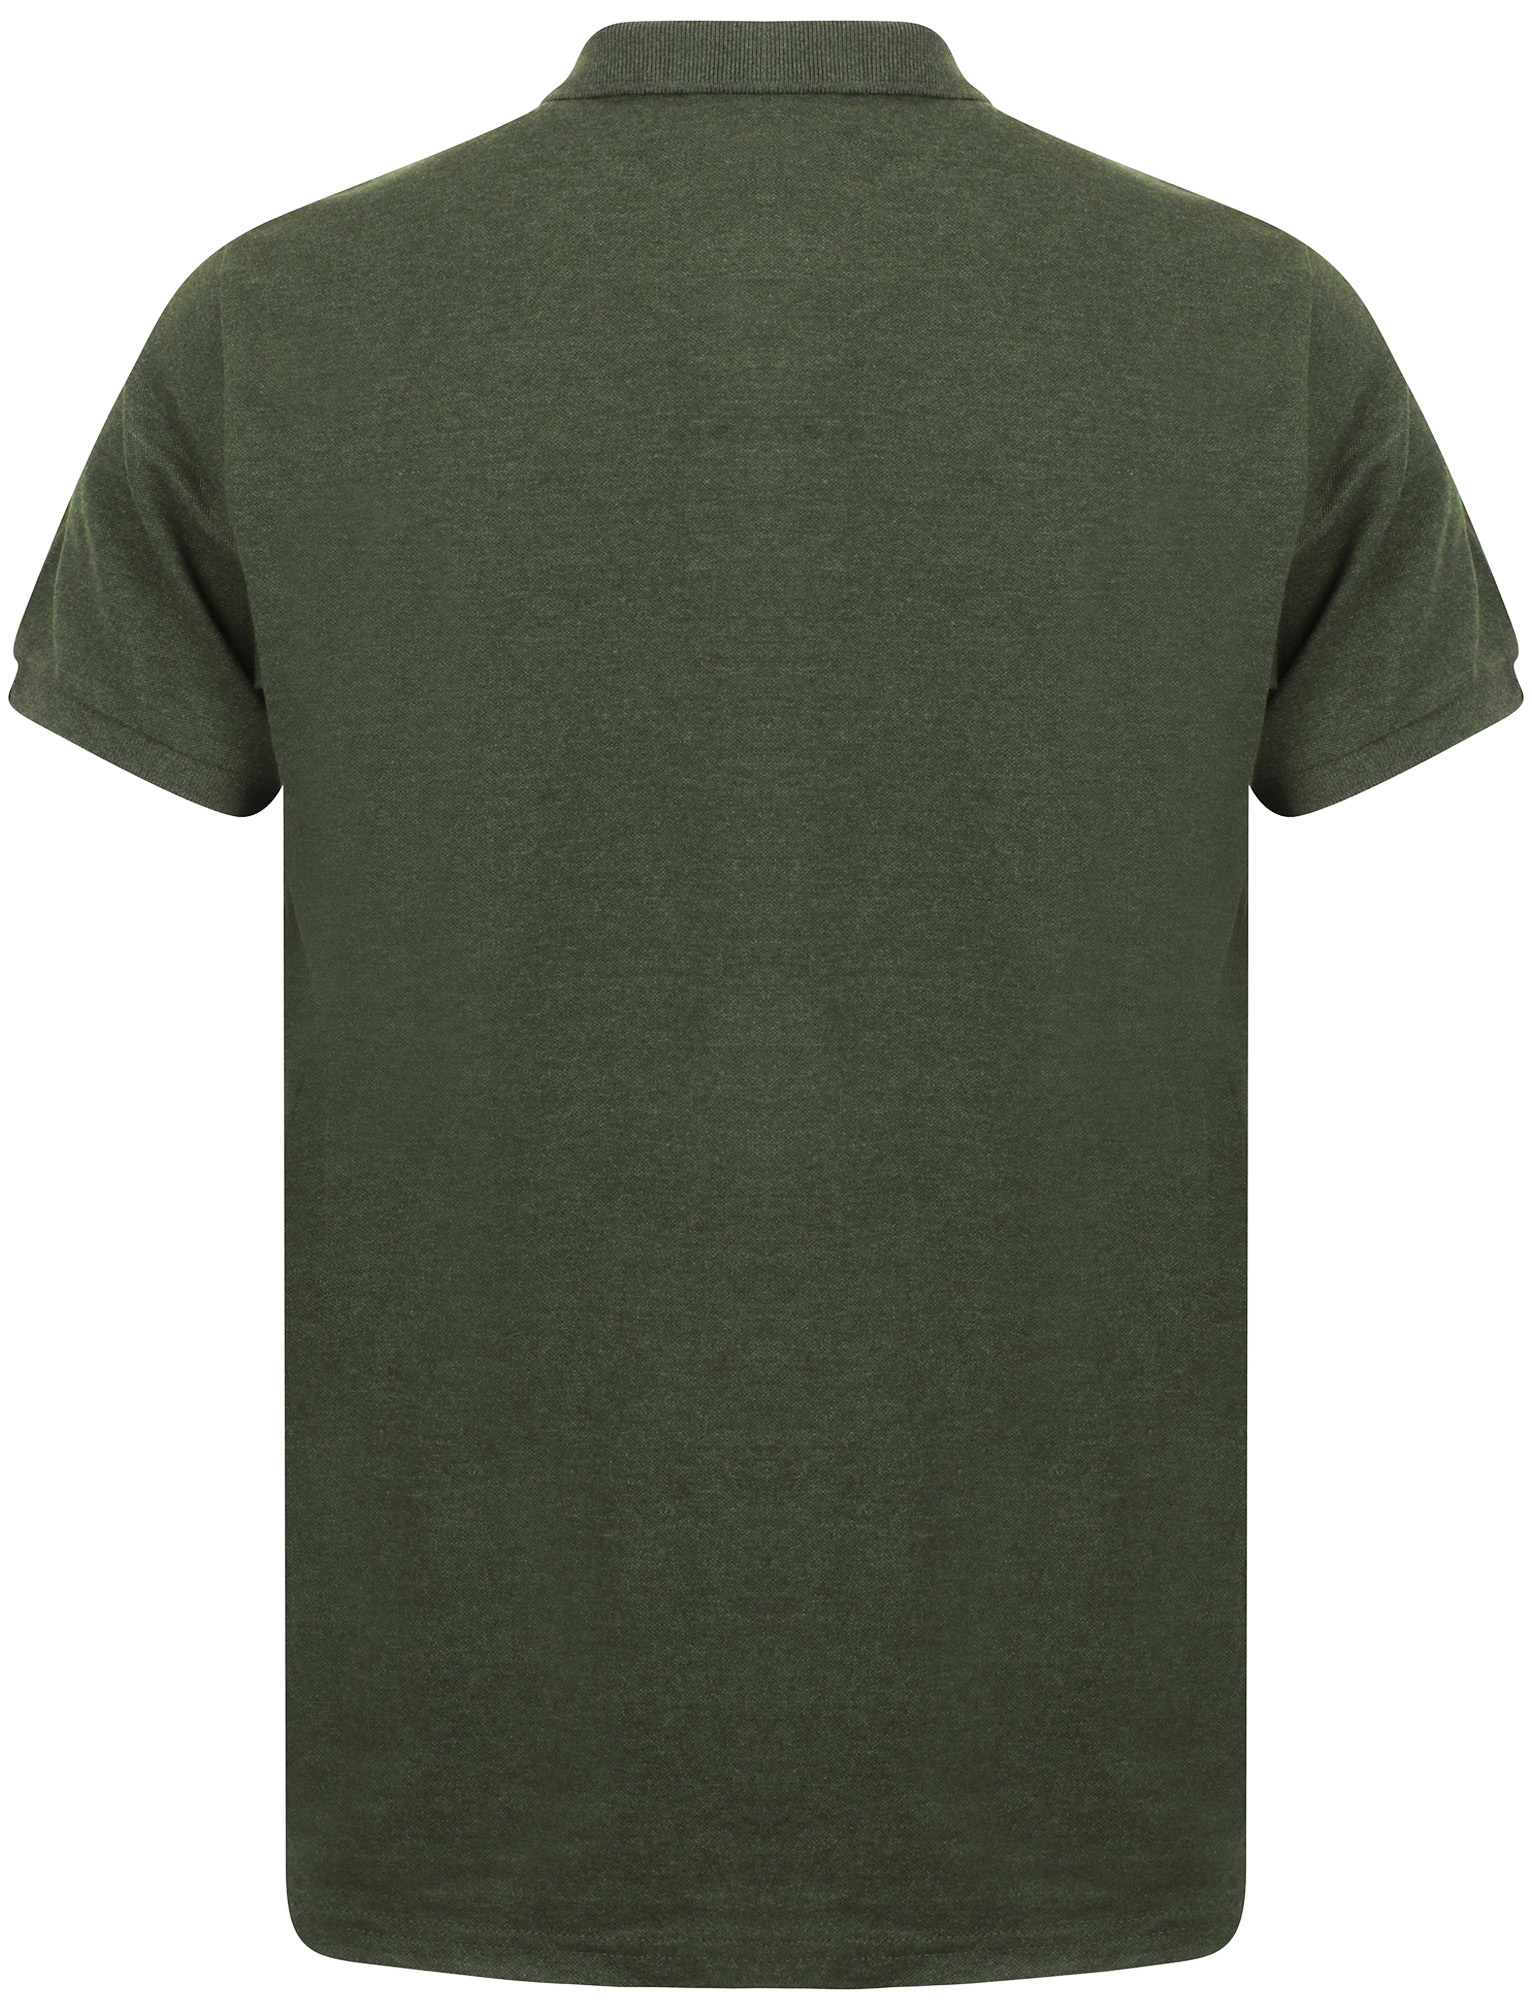 New-Mens-Tokyo-Laundry-Branded-Kuusamo-Cotton-Rich-Pique-Polo-Shirt-Size-S-XXL thumbnail 30